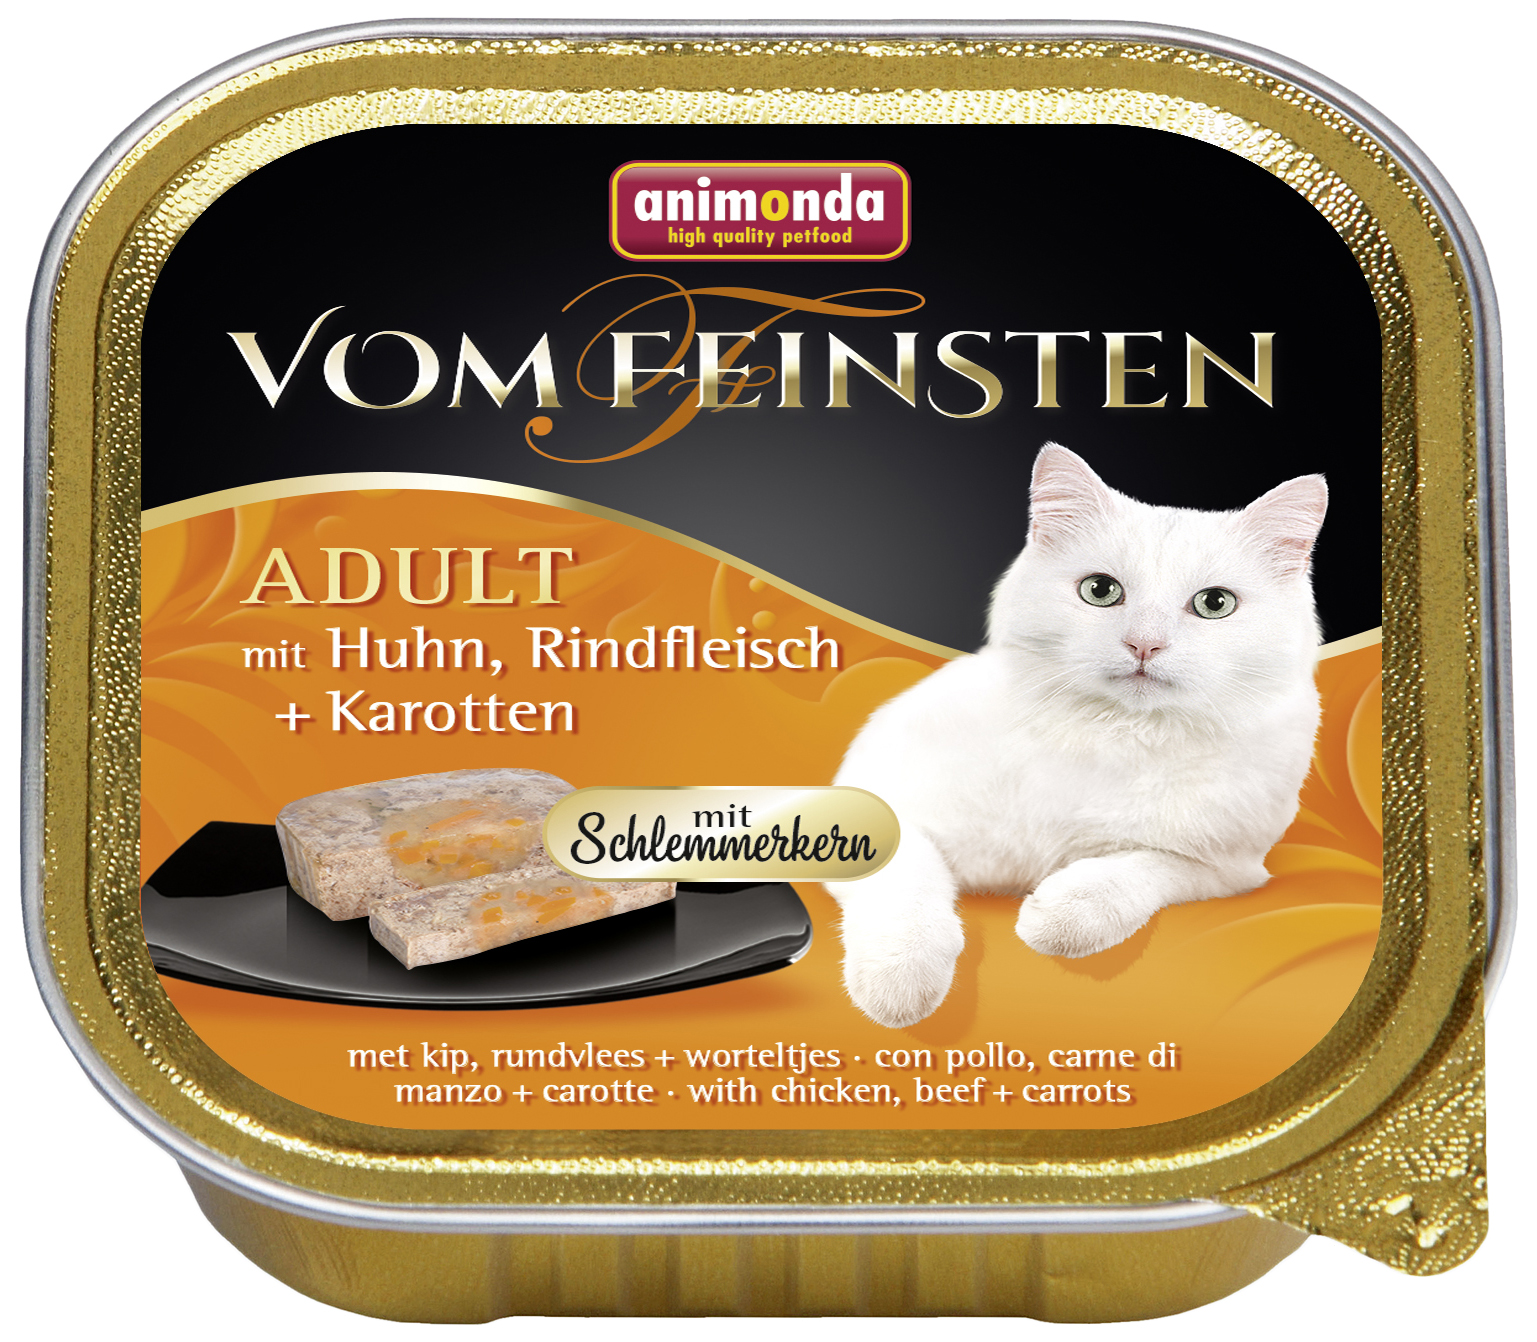 Консервы для кошек Animonda Vom Feinsten Adult, курица, говядина, овощи, 100г фото